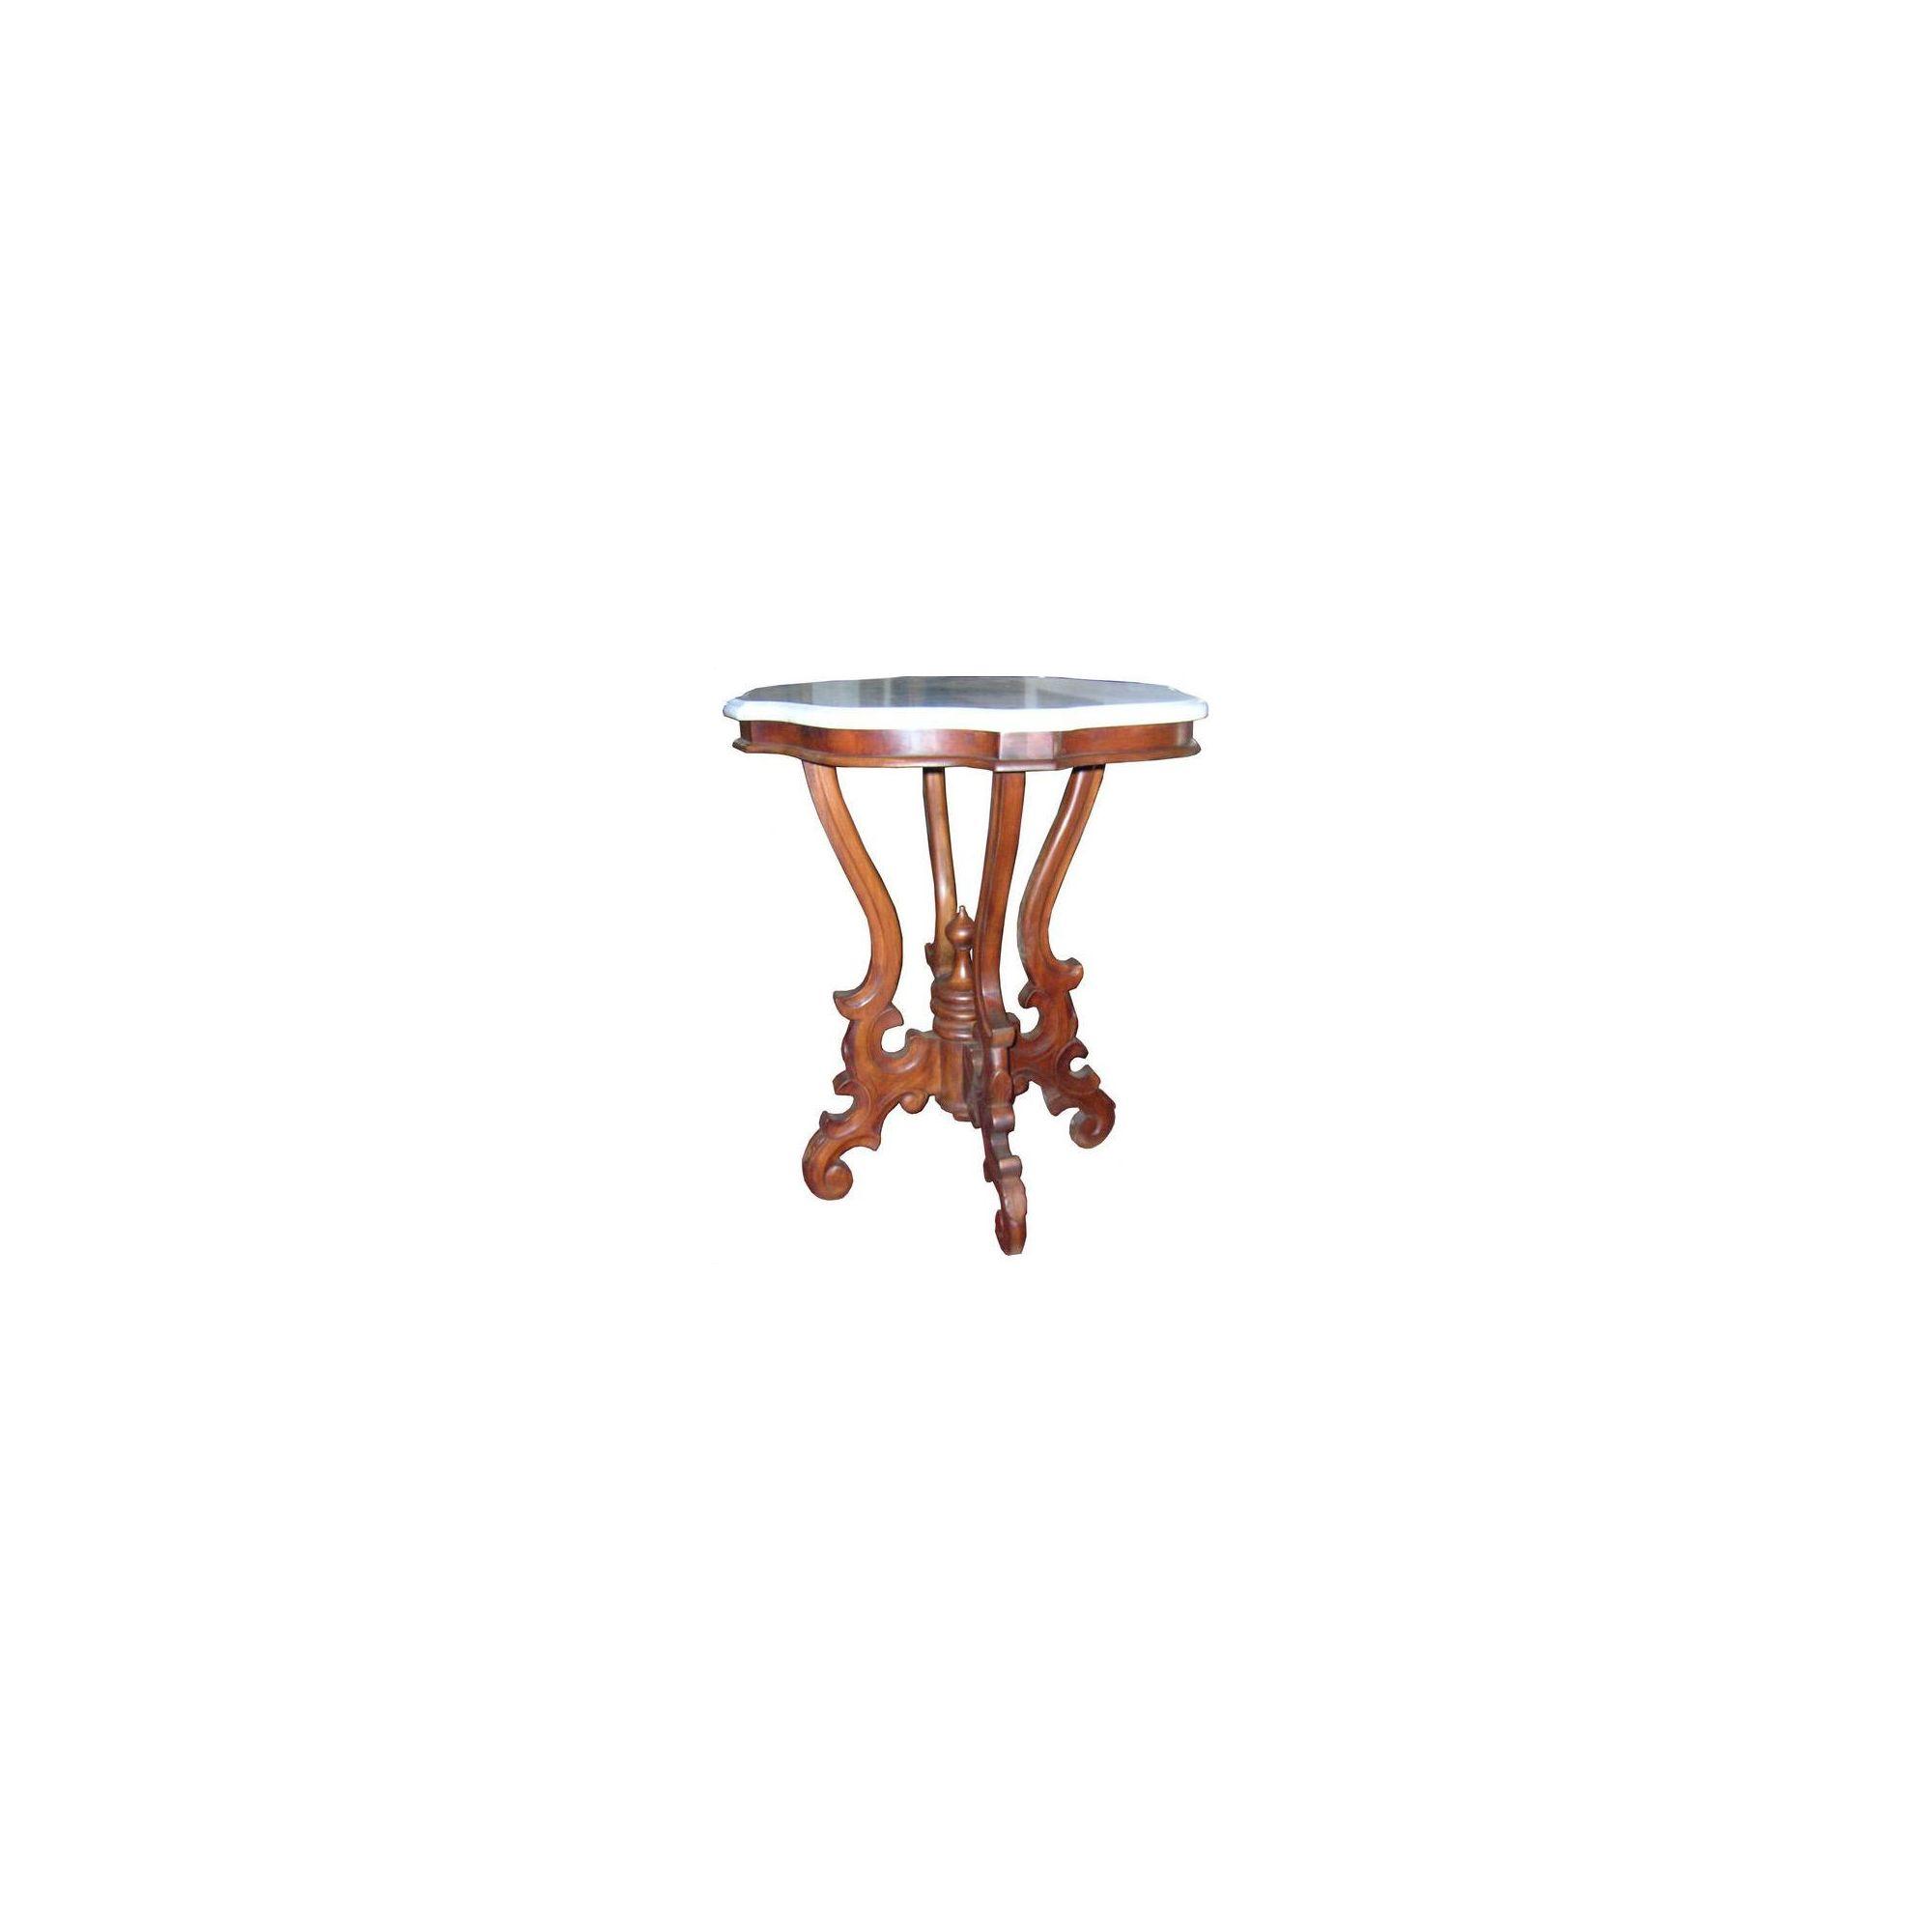 Lock stock and barrel Mahogany Victorian Side Table in Mahogany at Tesco Direct